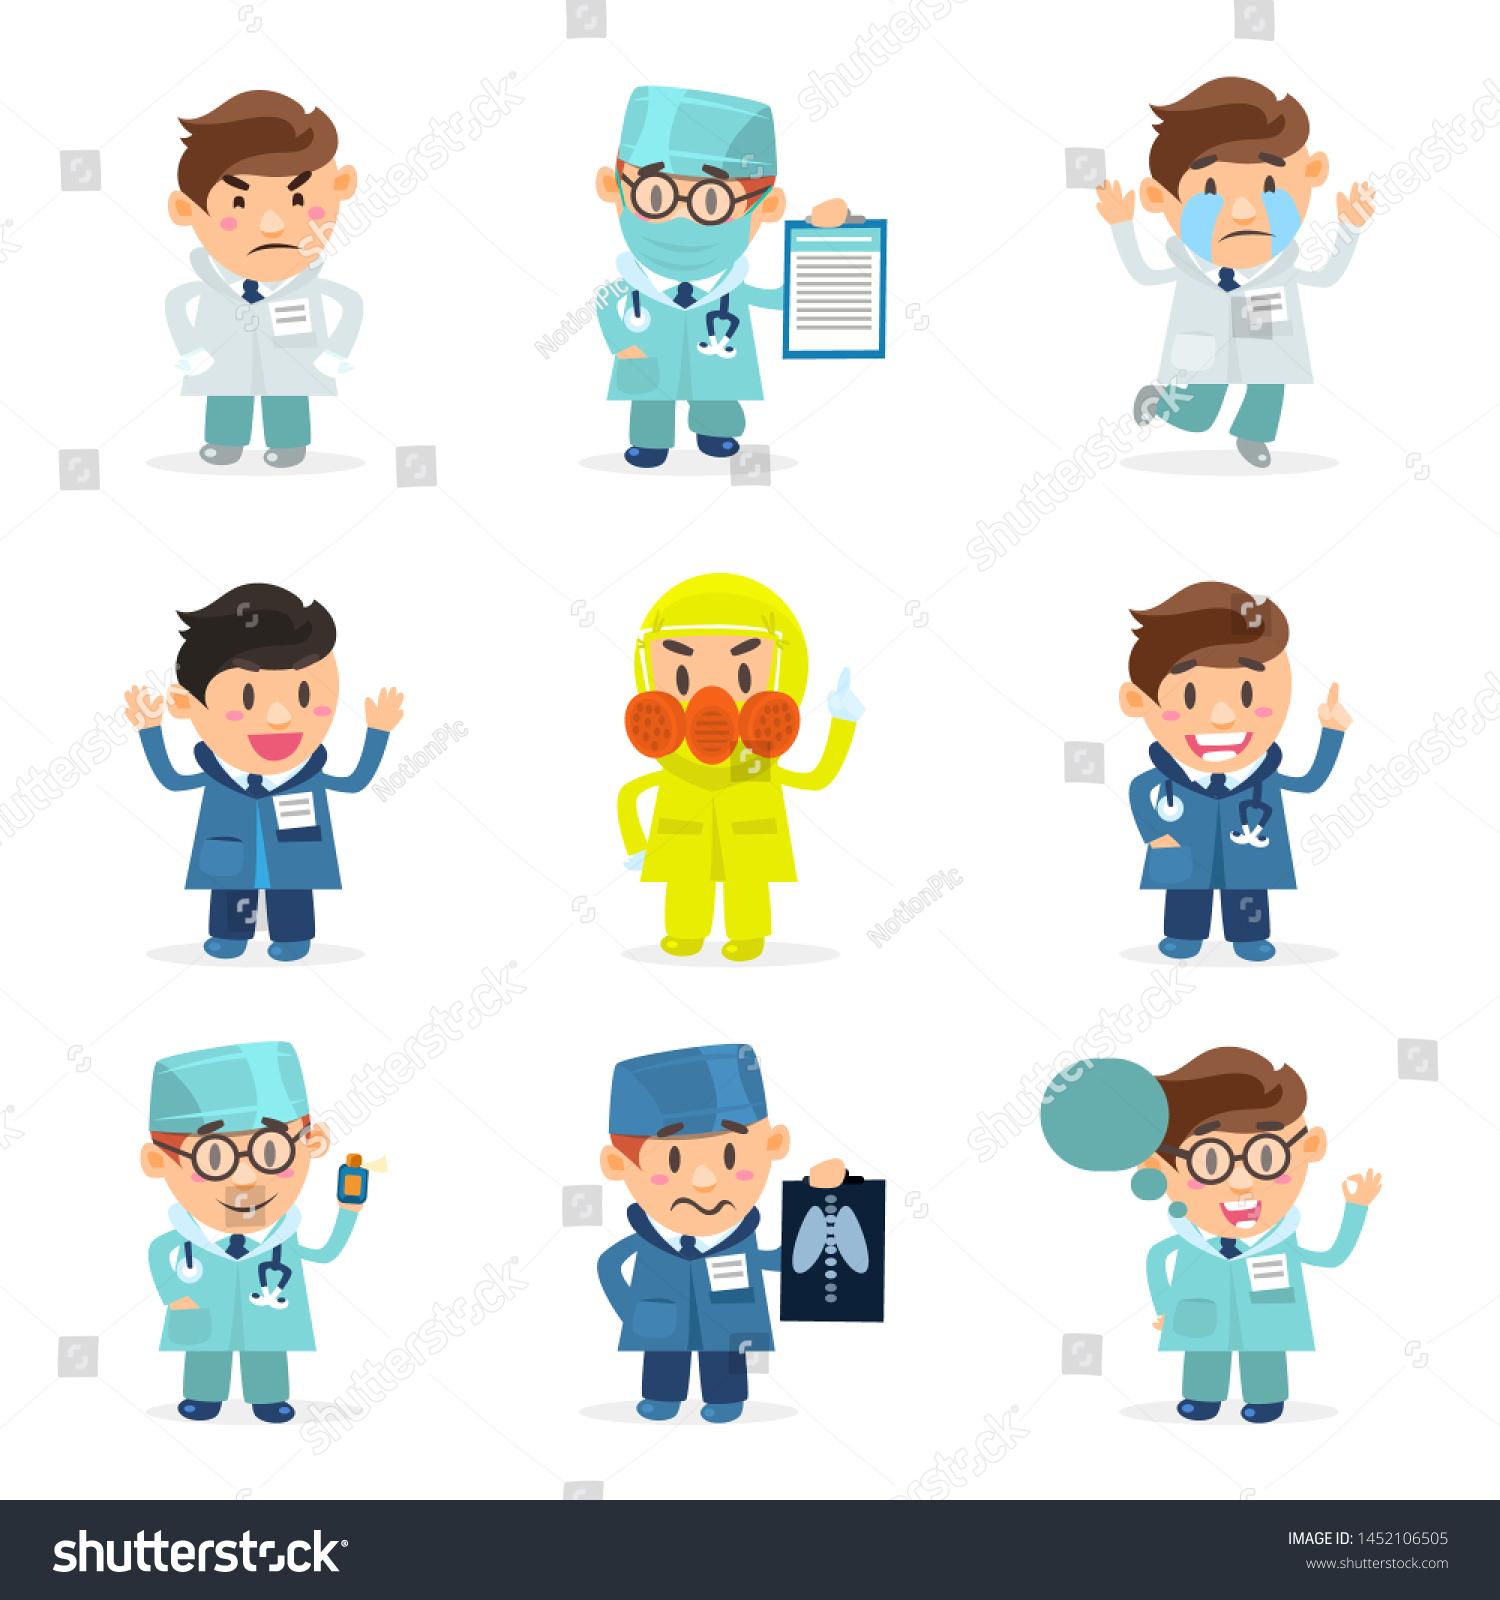 Funny Cartoon Hospital Pics funny doctors characters set hospital medical | royalty-free